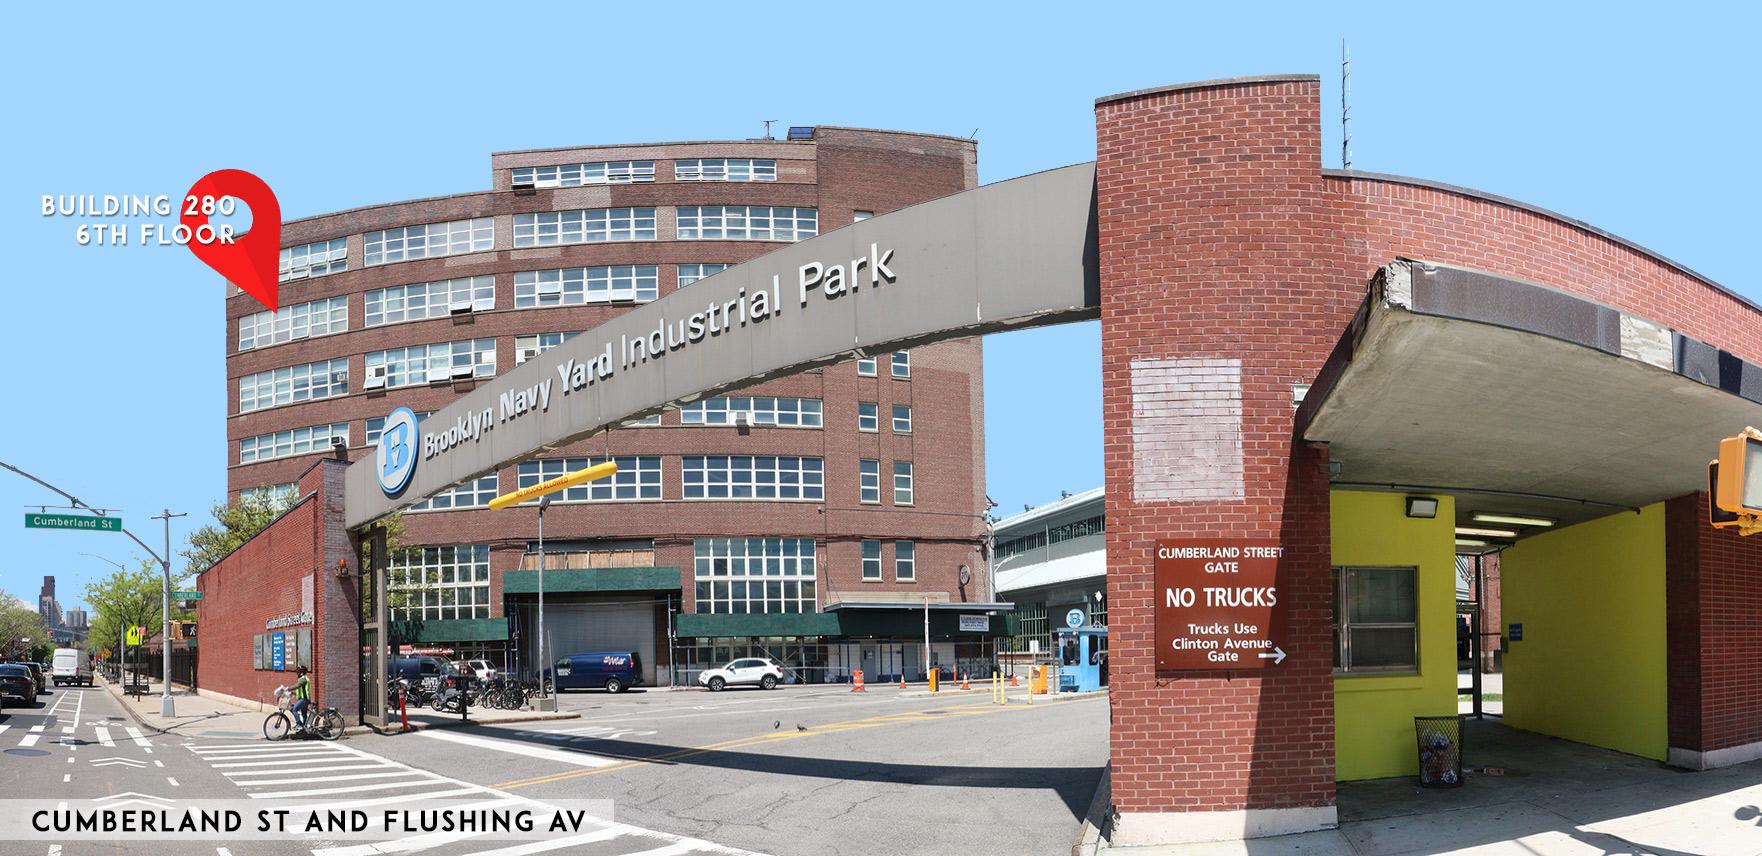 Brooklyn Navy Yard – Building 280 – 6th floor